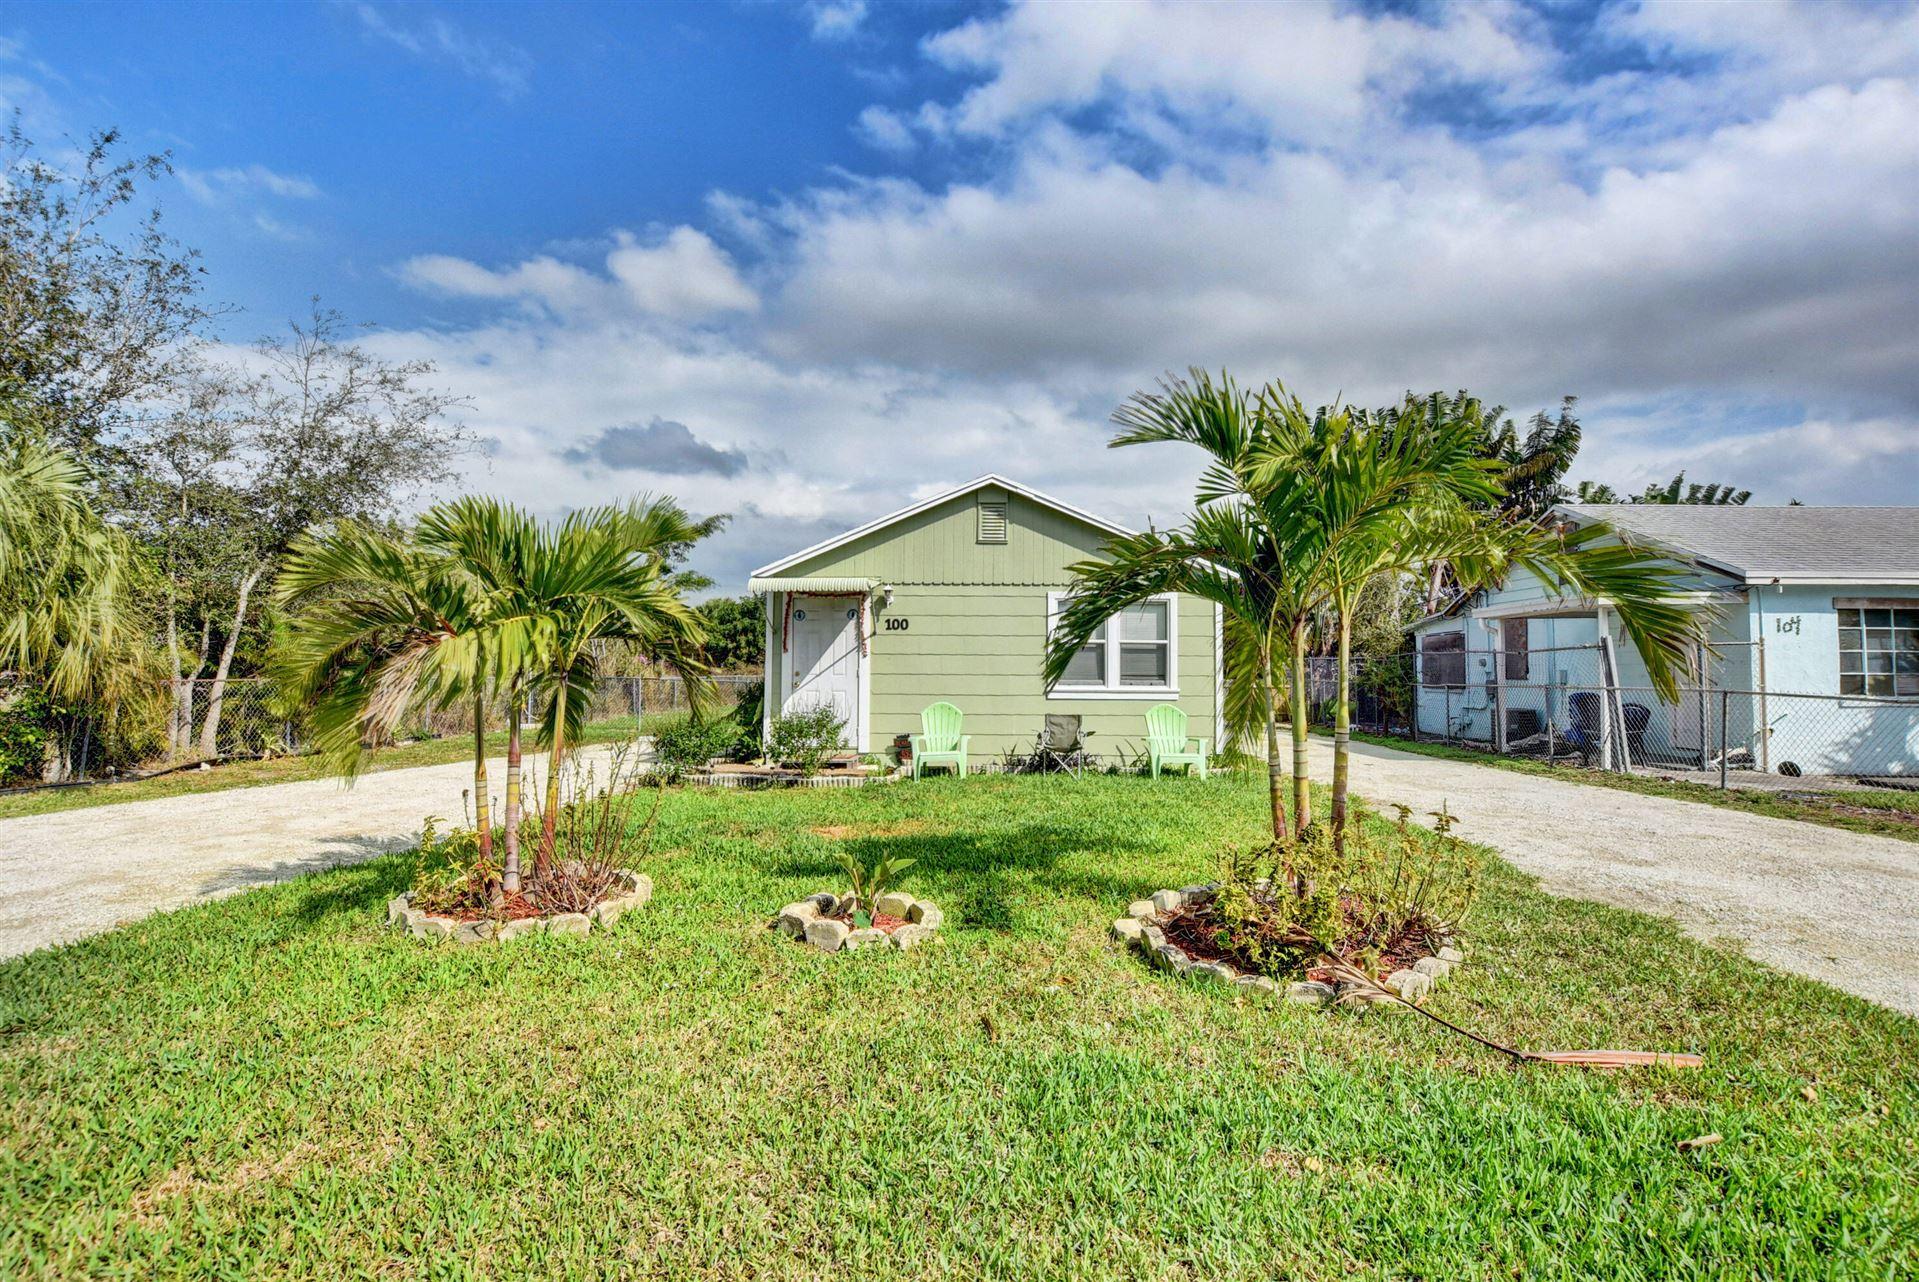 100 Urquhart Street, Lake Worth, FL 33461 - #: RX-10700027